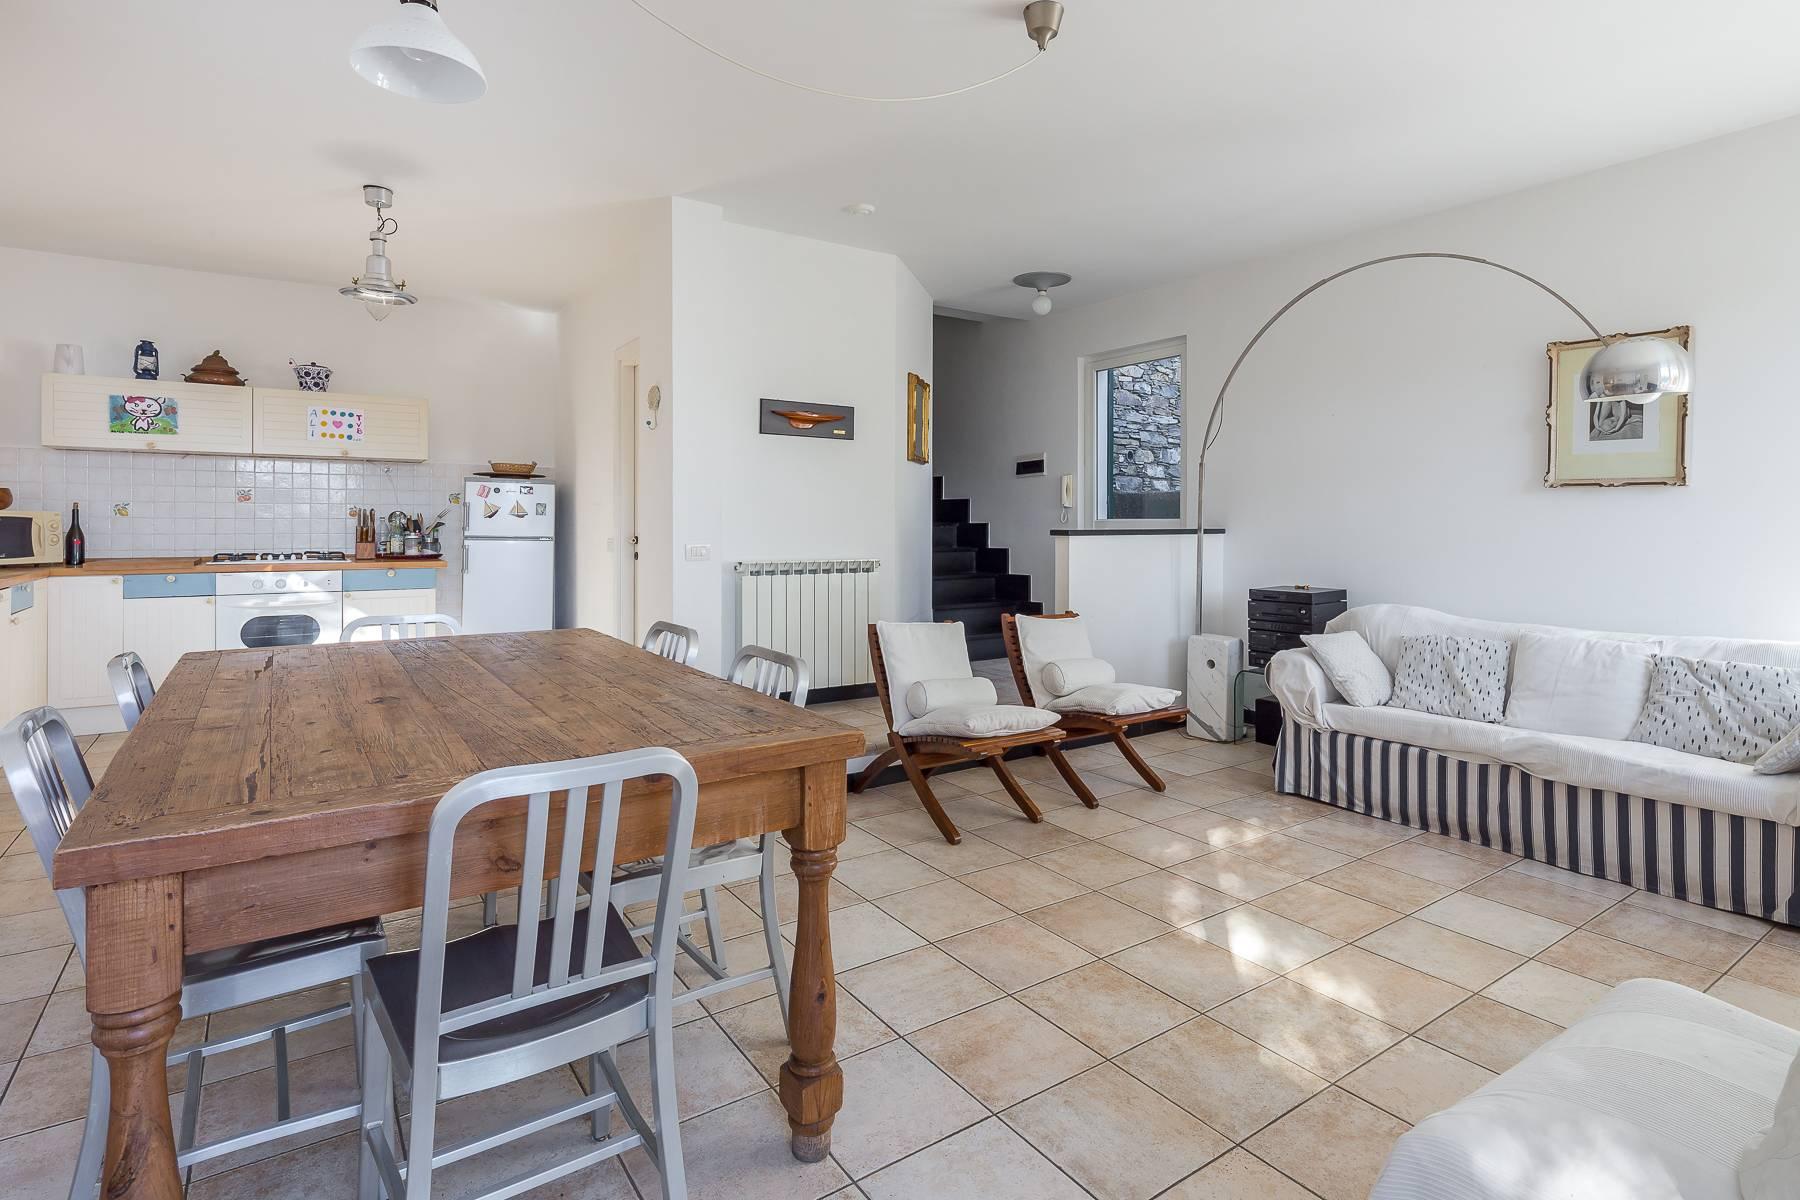 Casa indipendente in Vendita a Zoagli: 5 locali, 100 mq - Foto 17